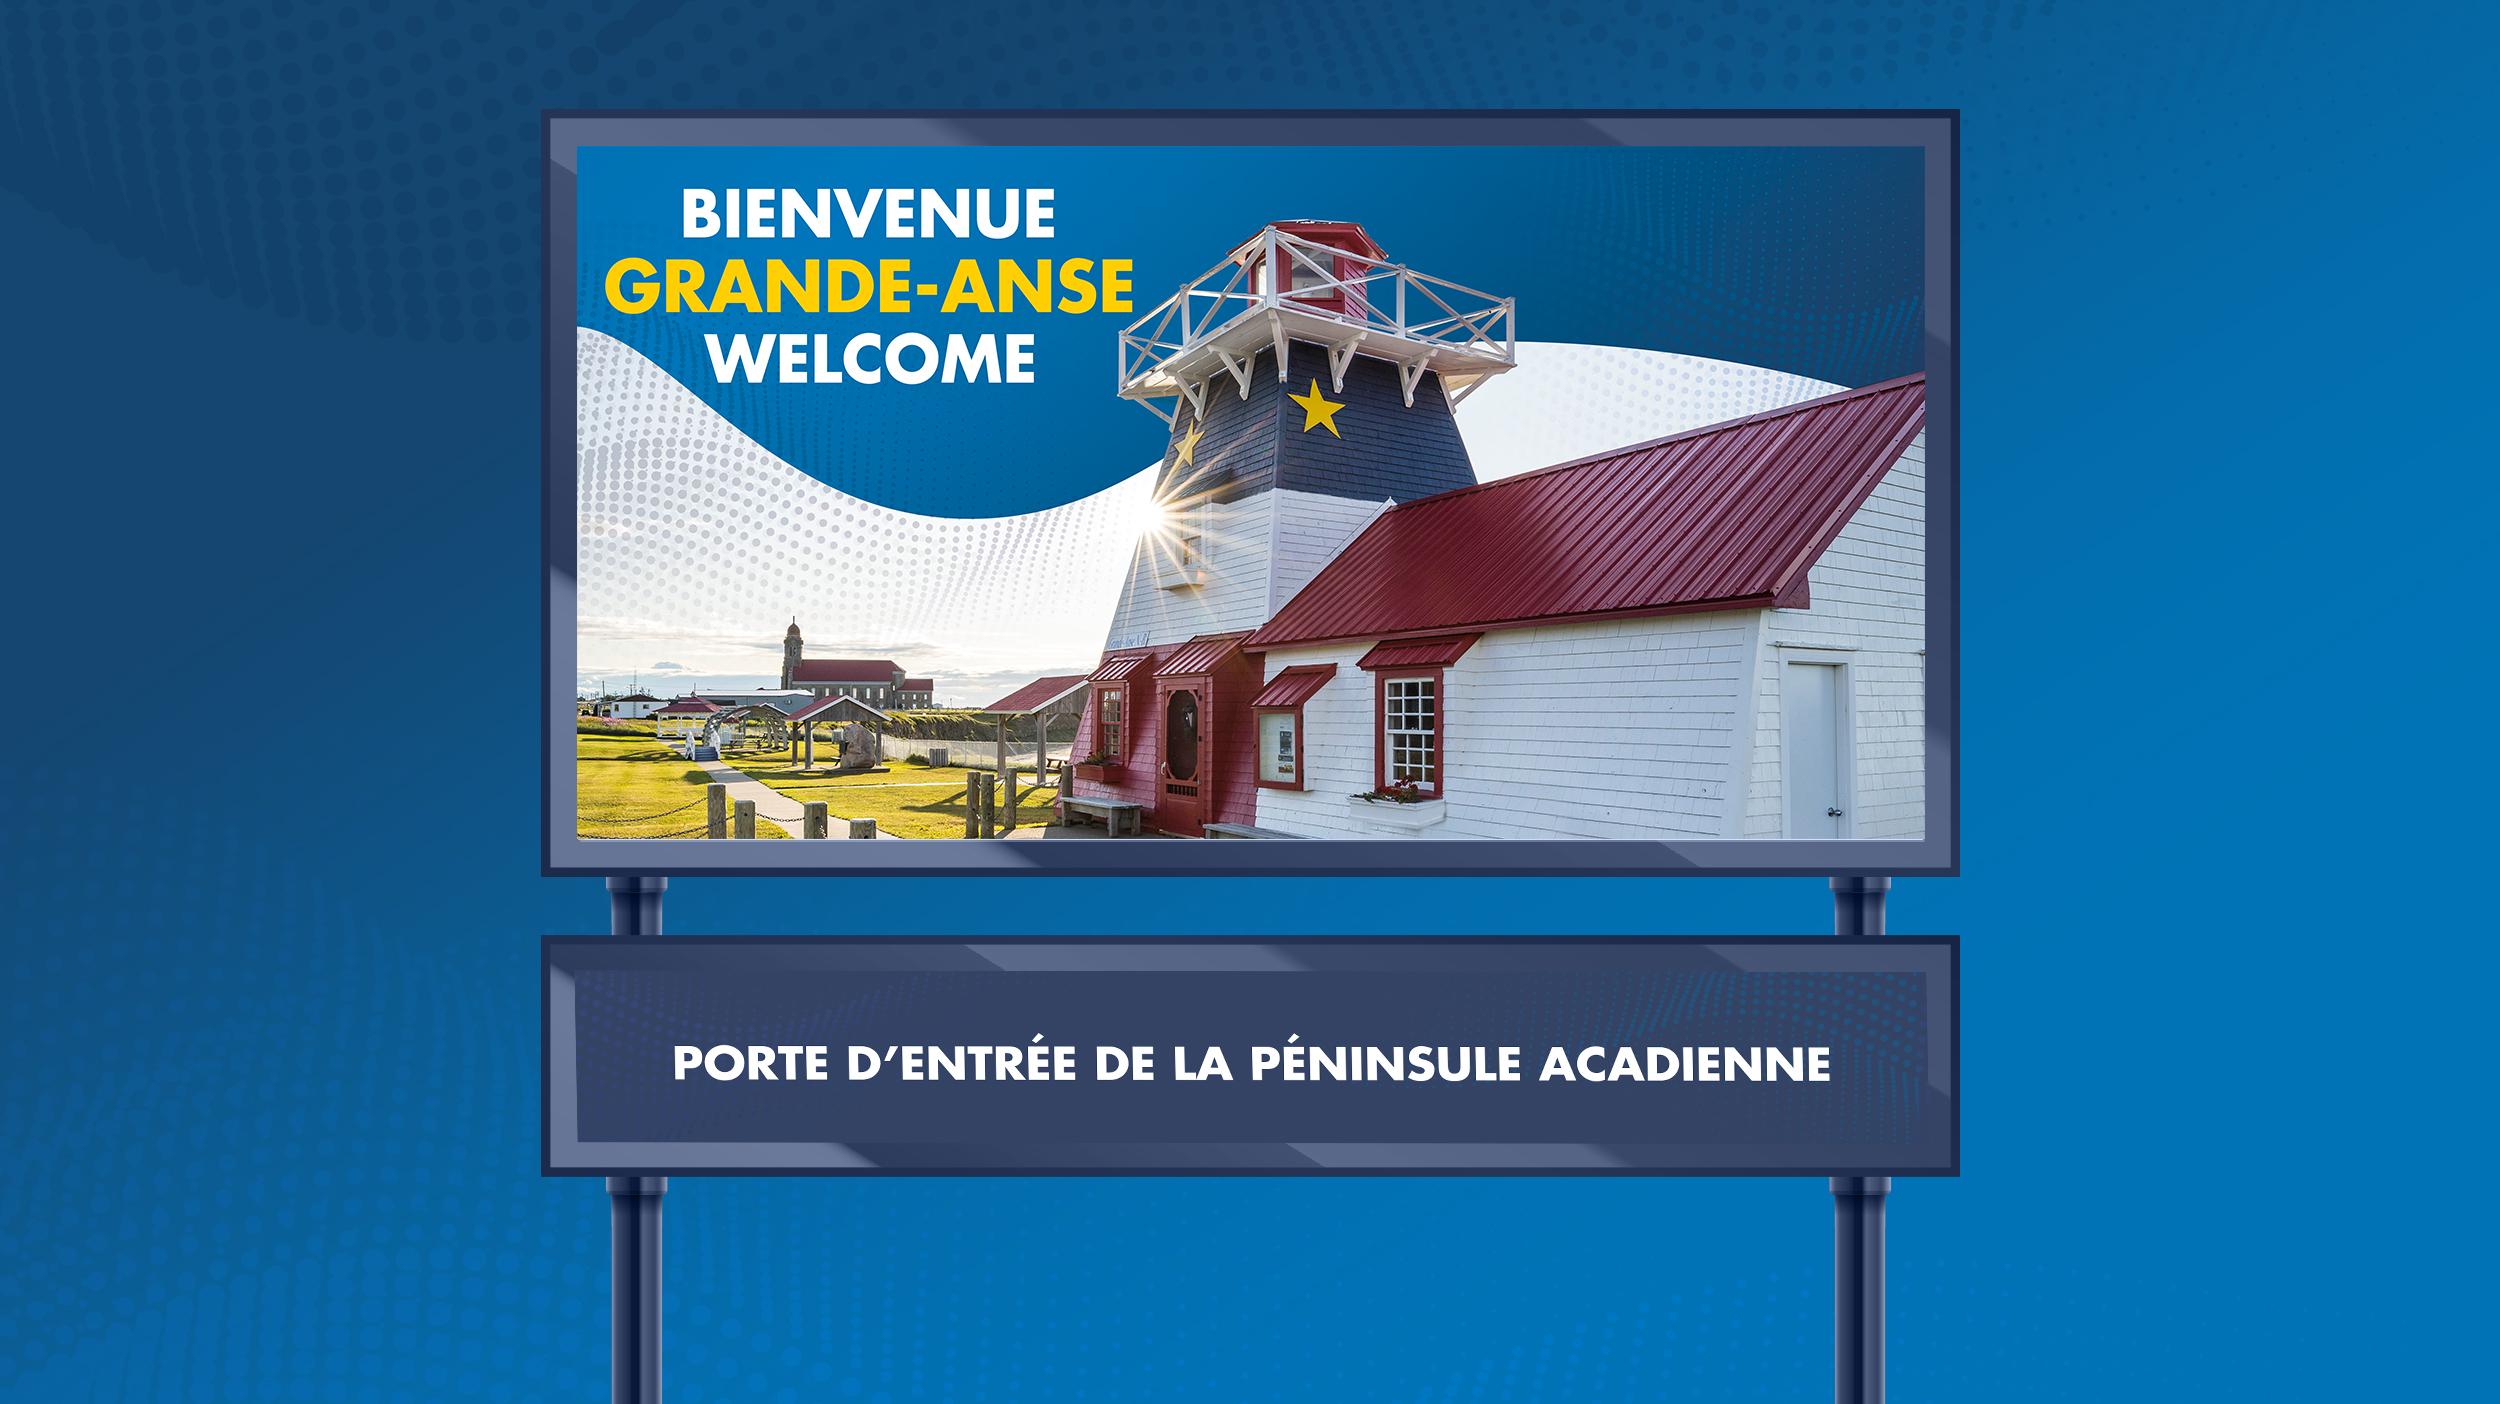 Village of Grande-Anse